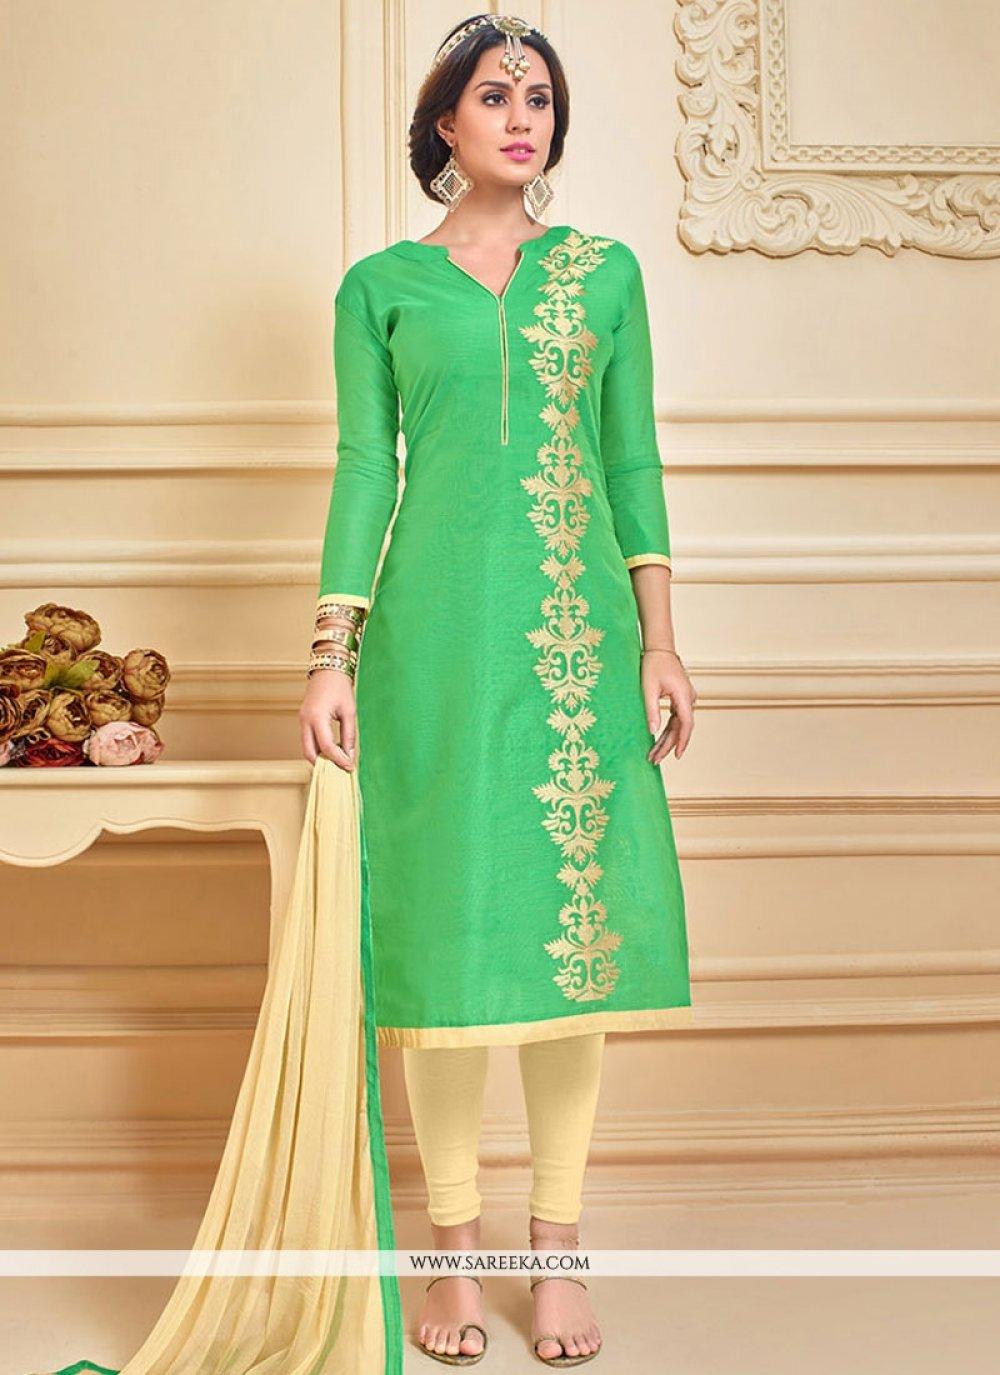 Chanderi Cotton Green Embroidered Work Churidar Suit